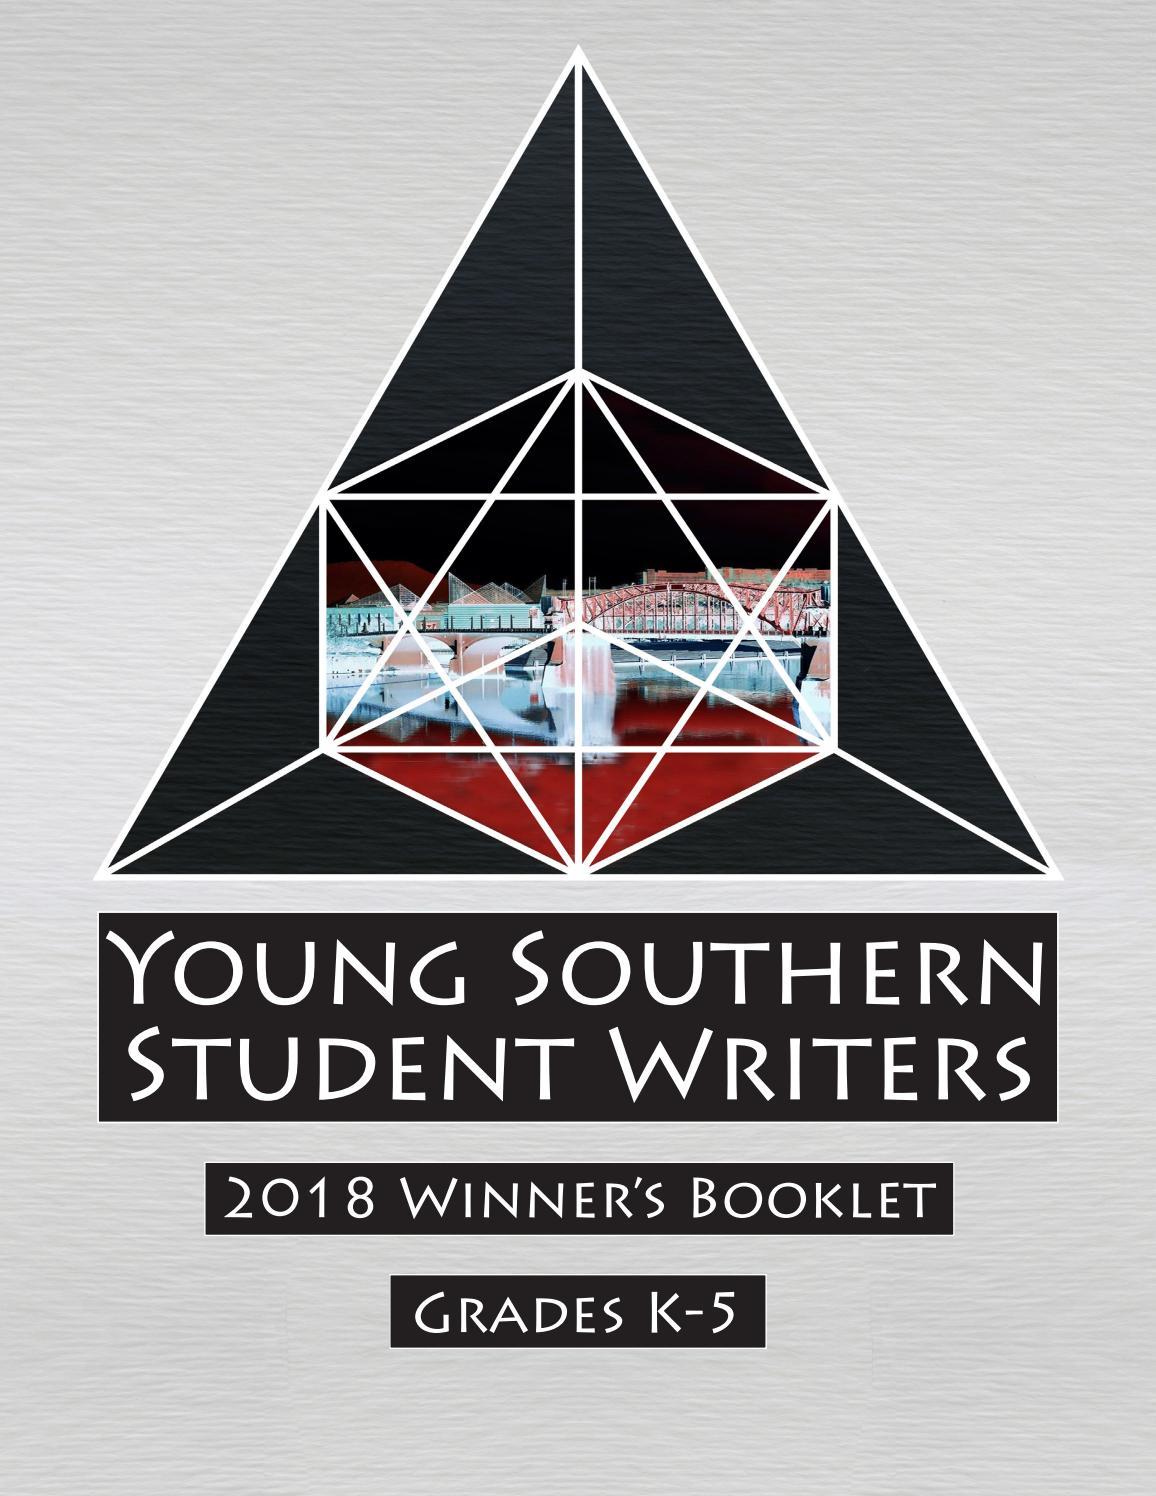 a08c6351 Young Southern Student Writers - Winners 2018 by Joe Wilferth - issuu